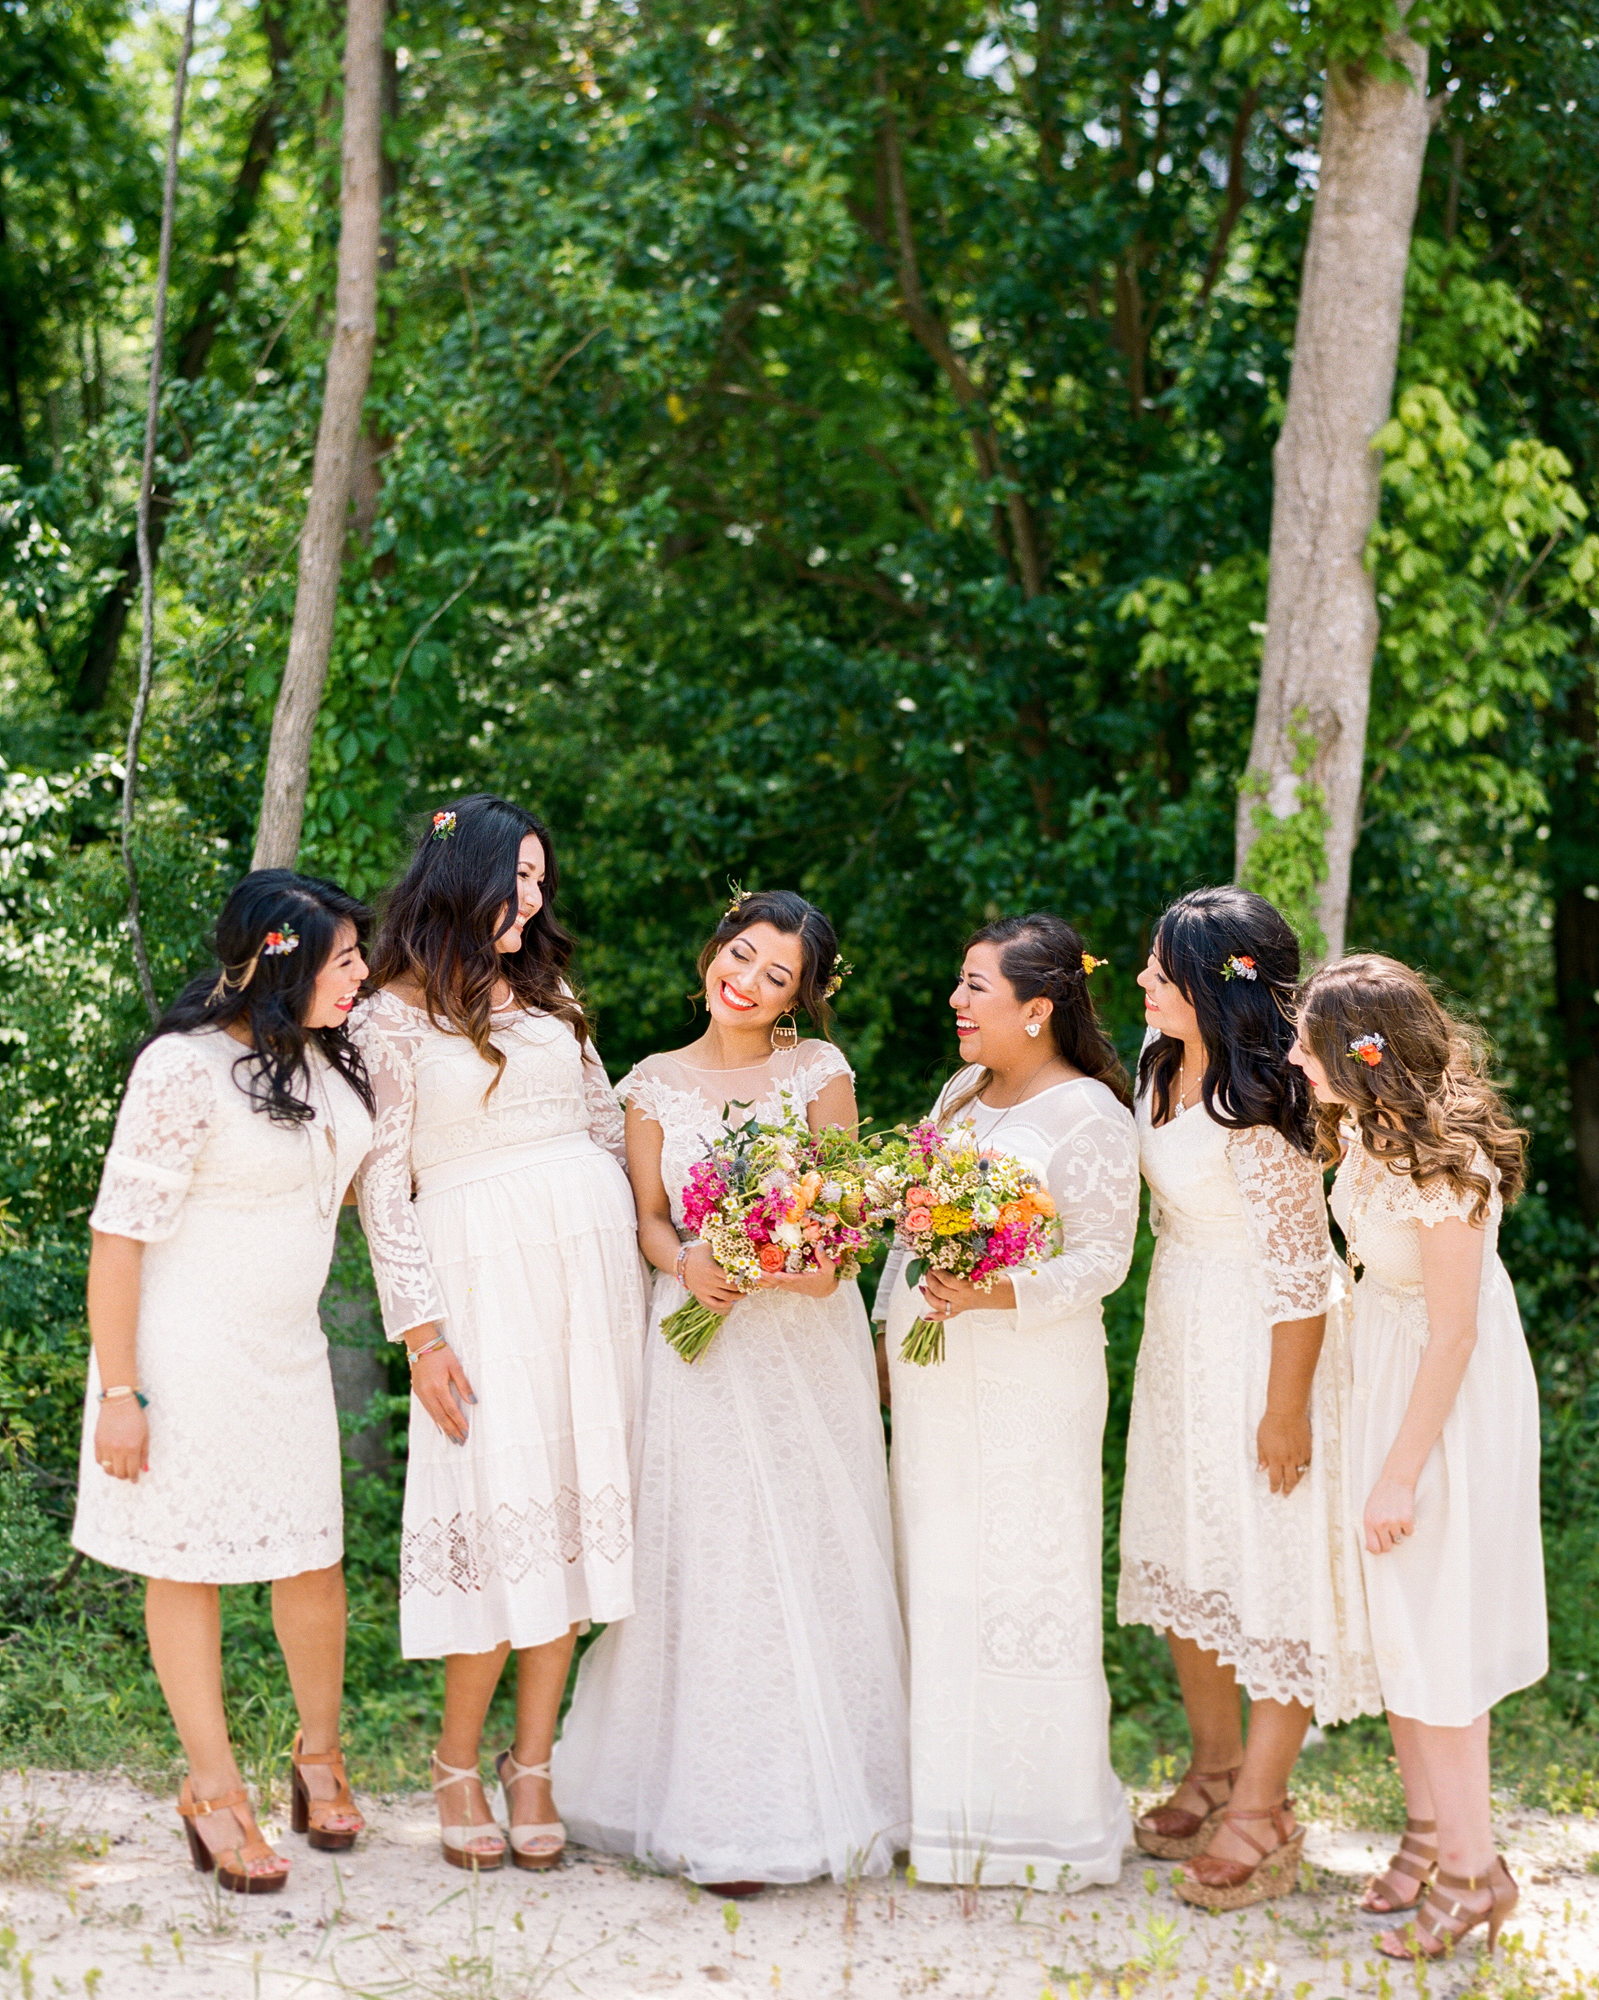 atalia-raul-wedding-bridesmaids-15-s112395-1215.jpg